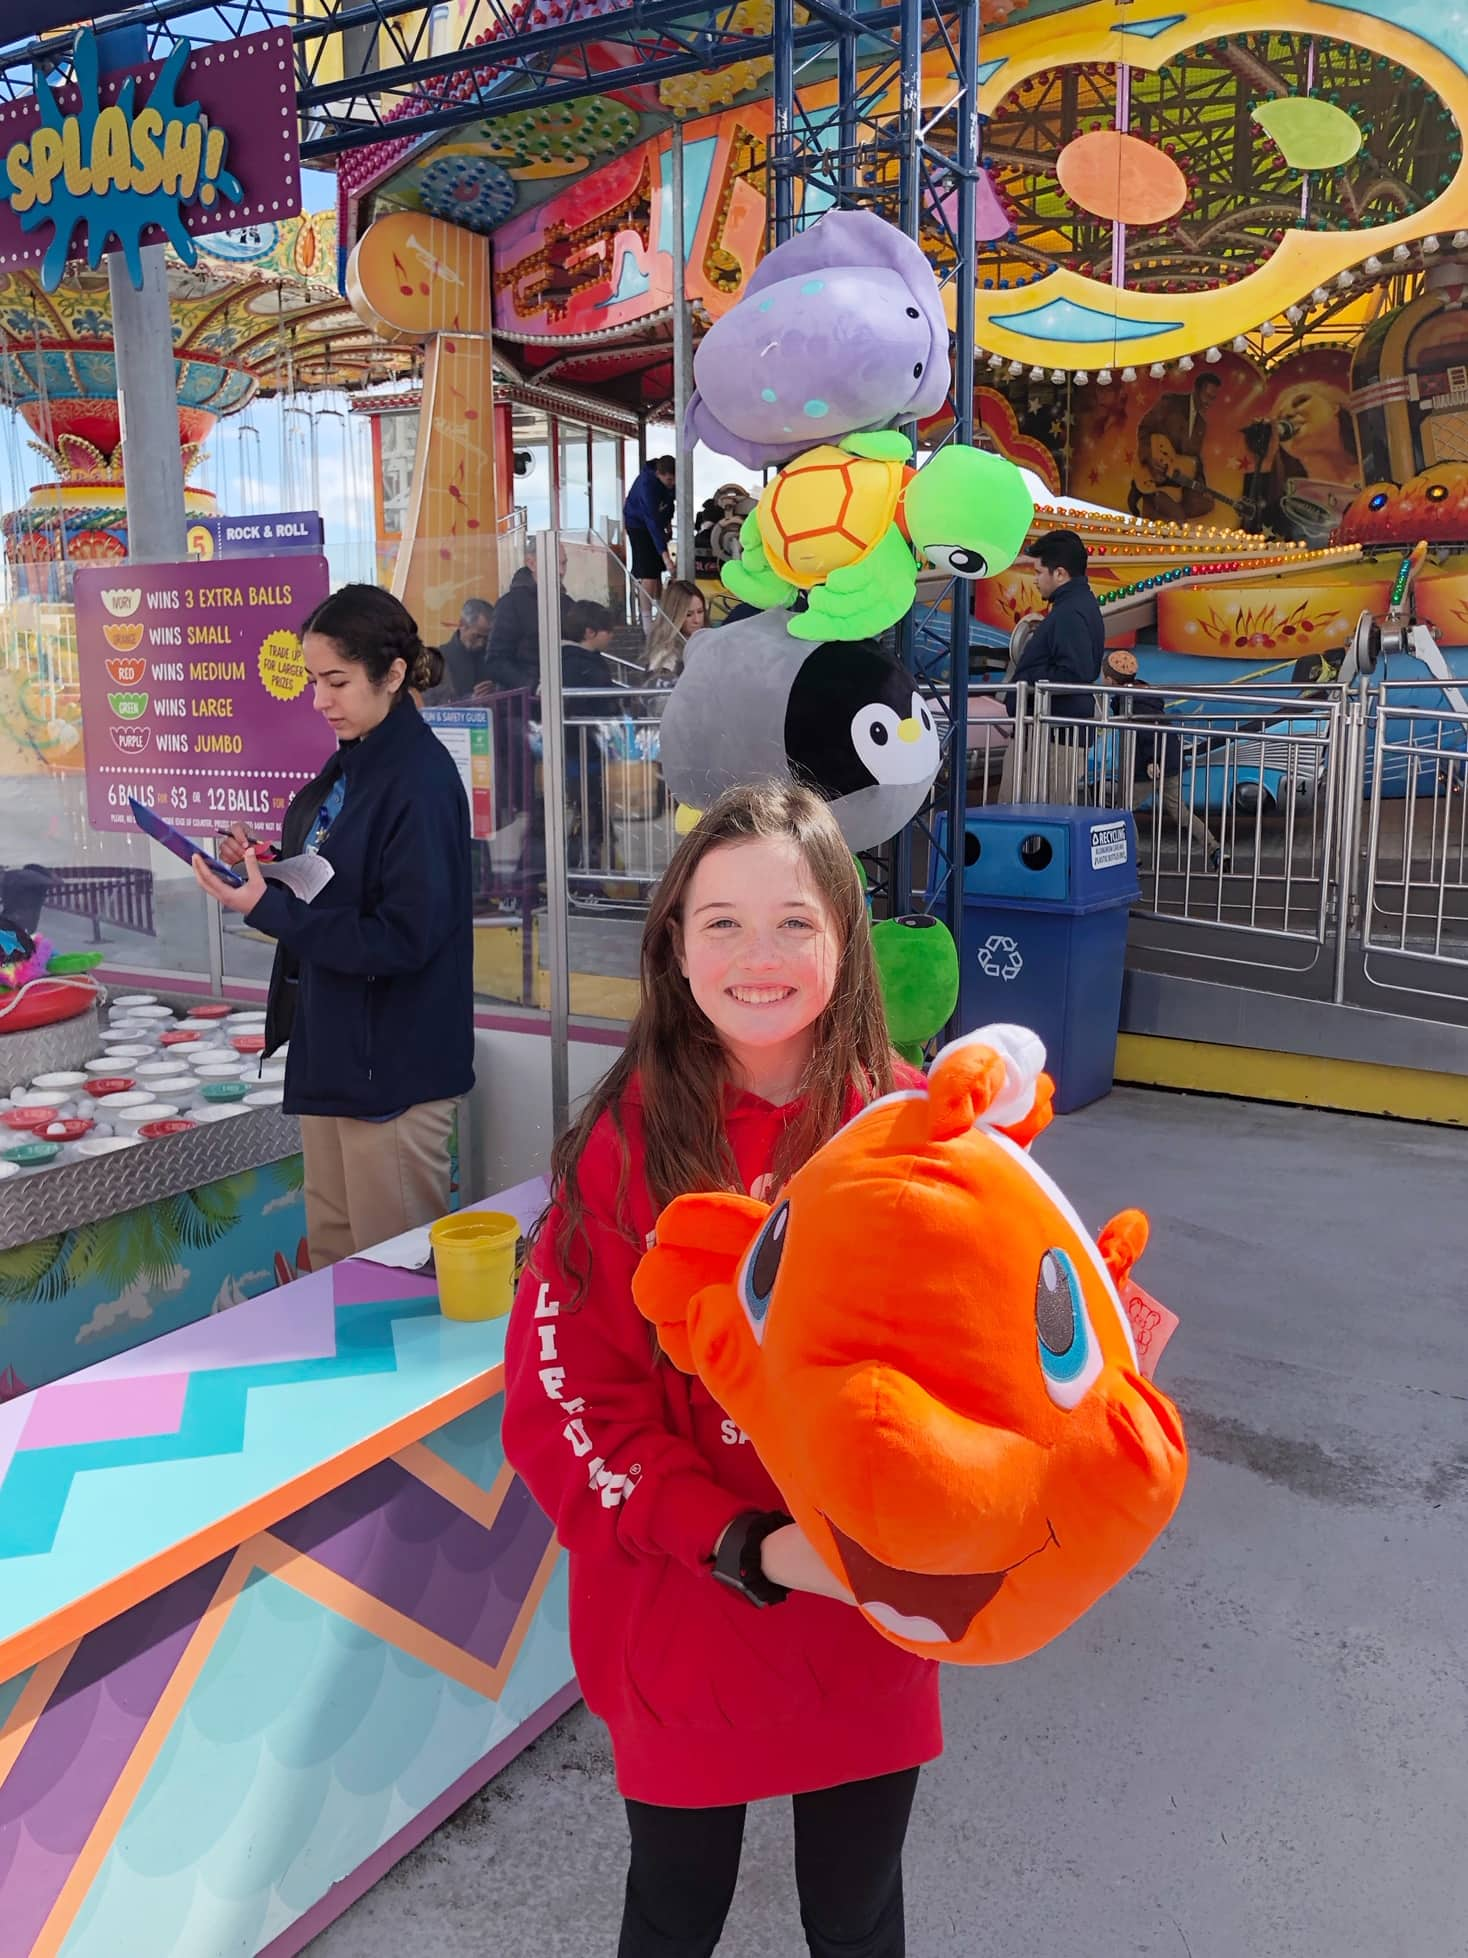 Carnival games at the Santa Cruz Boardwalk